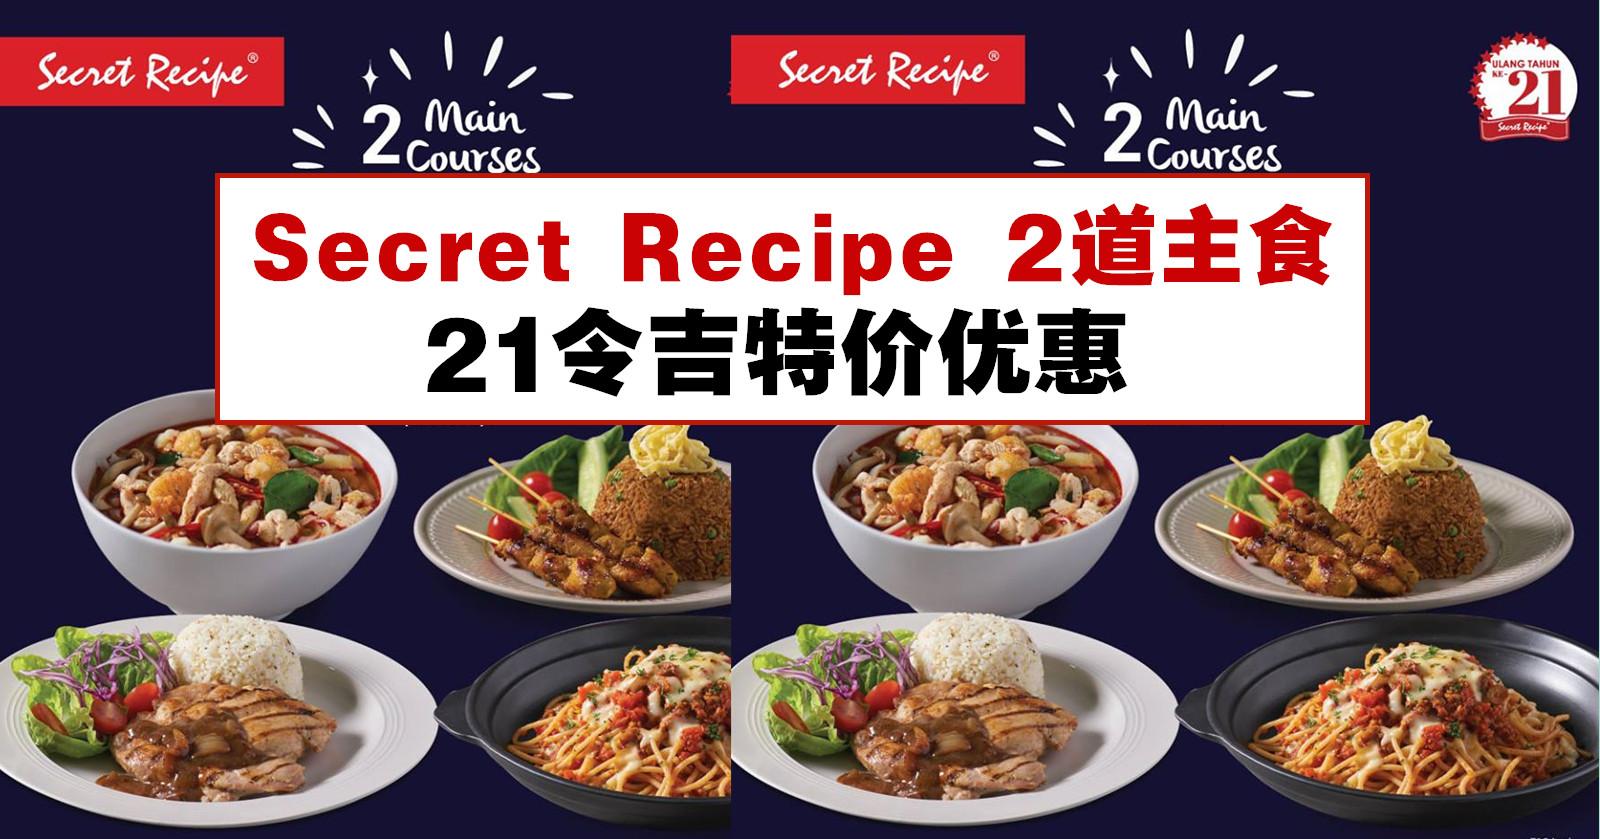 Secret Recipe 2道主食21令吉特价优惠